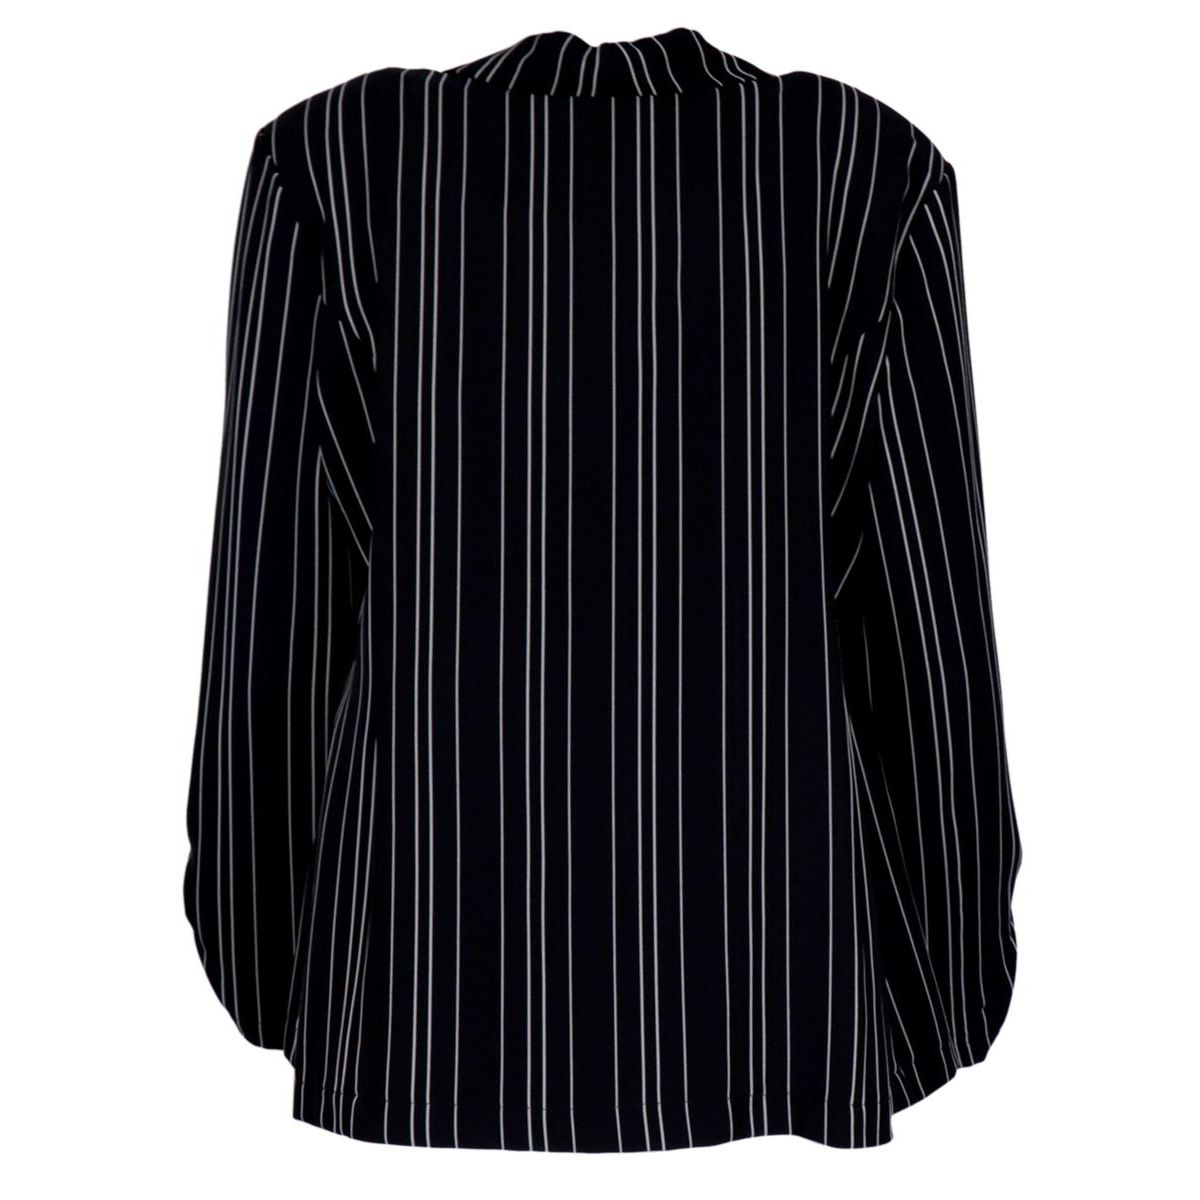 Crepe jacket with two-tone striped pattern Blue / white Joseph Ribkoff